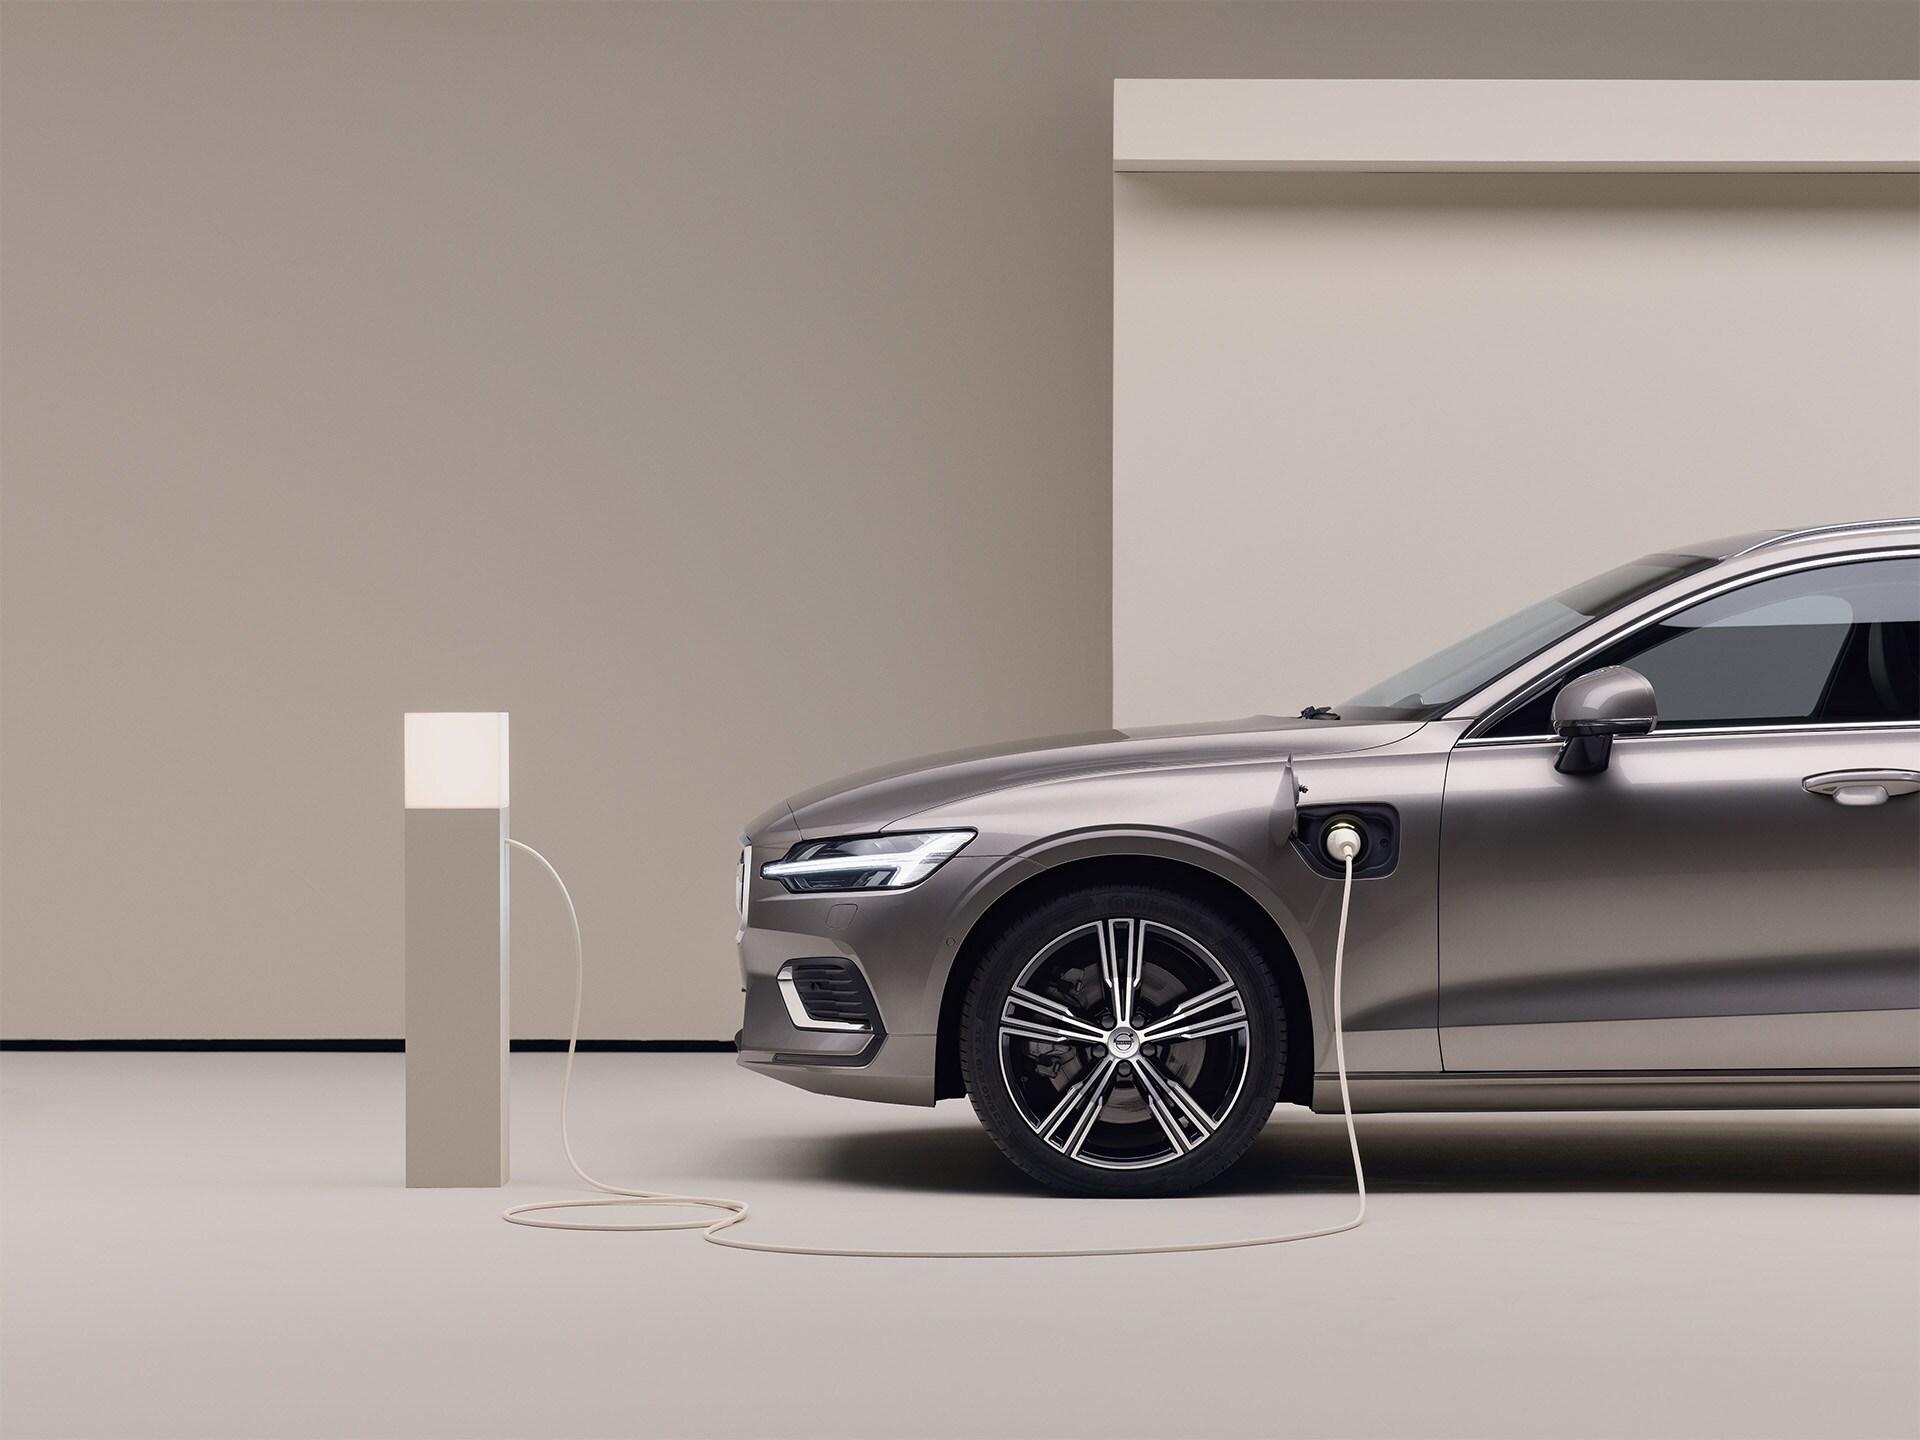 Volvo Estate สี Parked Grey กำลังชาร์จไฟอยู่ที่จุดชาร์จ